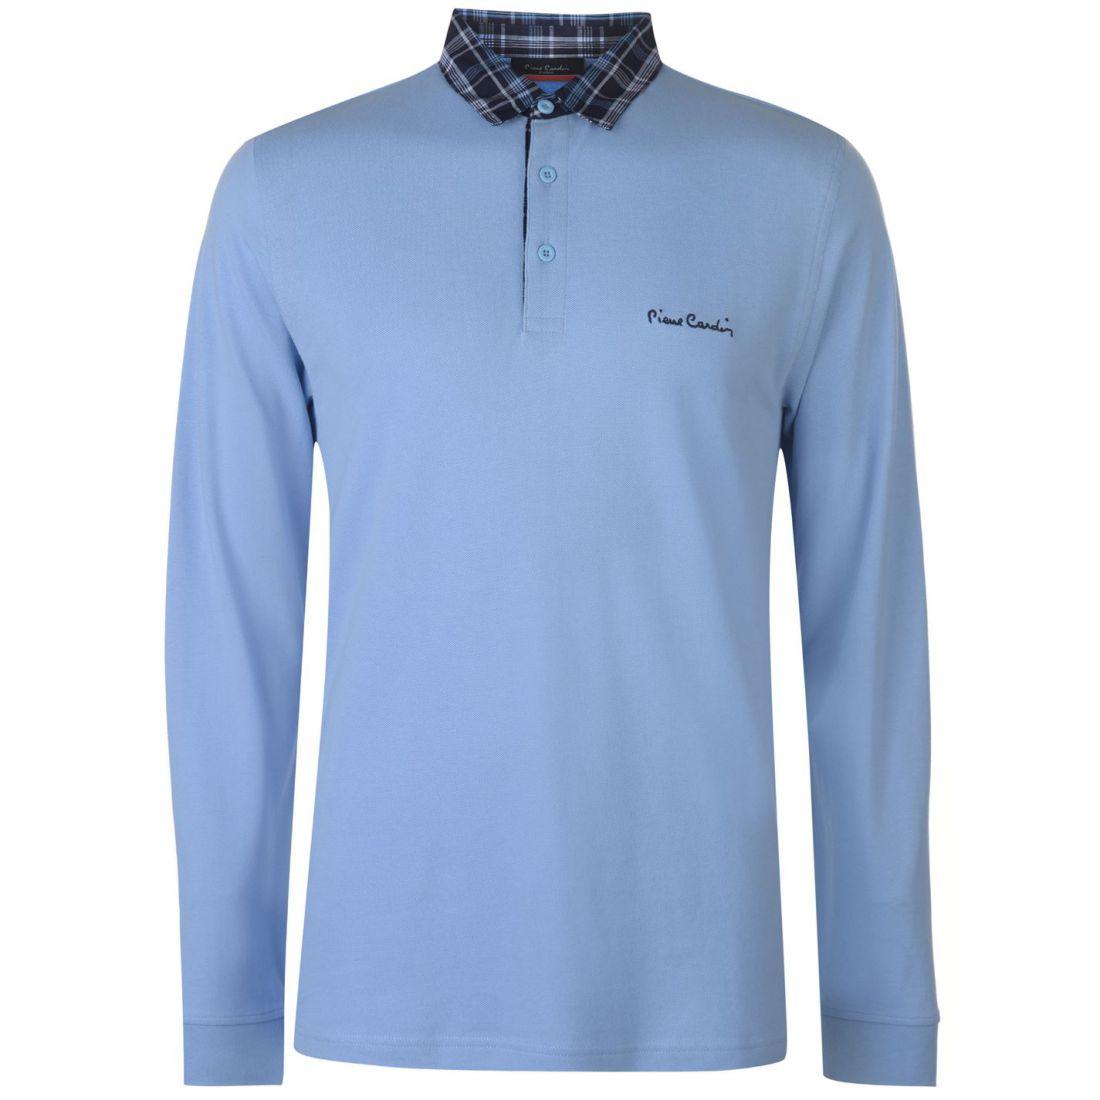 Details About Pierre Cardin Mens Long Sleeve Check Collar Polo Shirt Top Cotton Button Placket